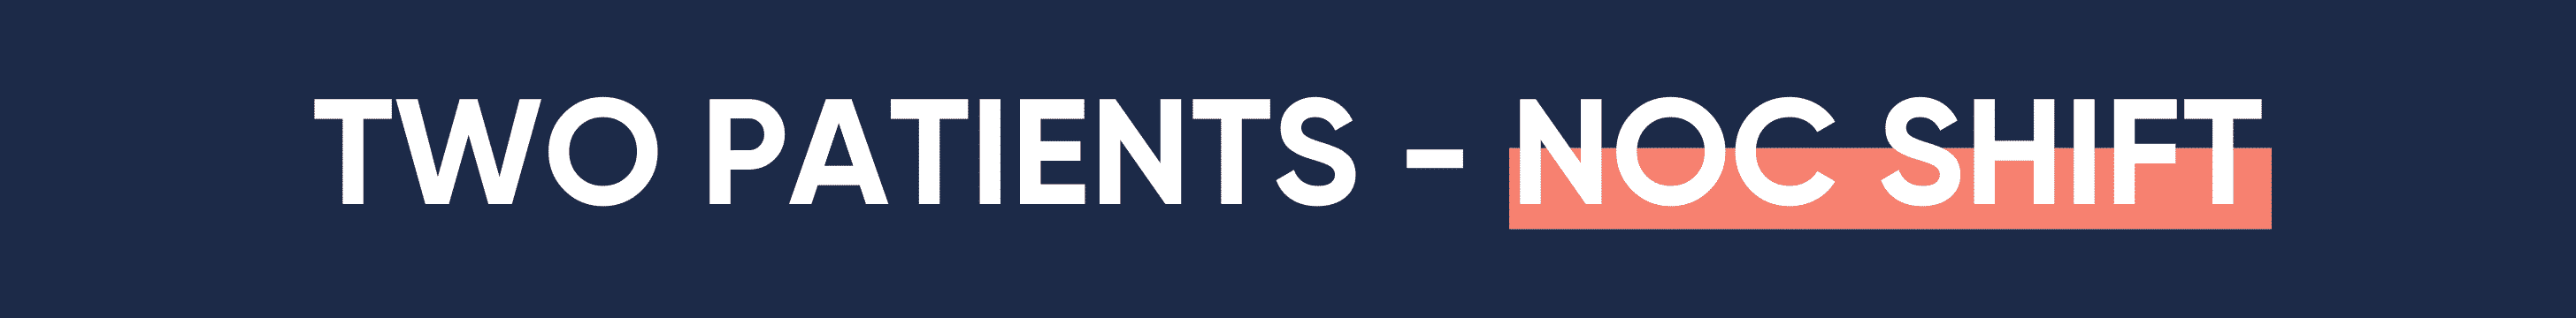 NURSING RUN SHEET TWO PATIENTS NOC